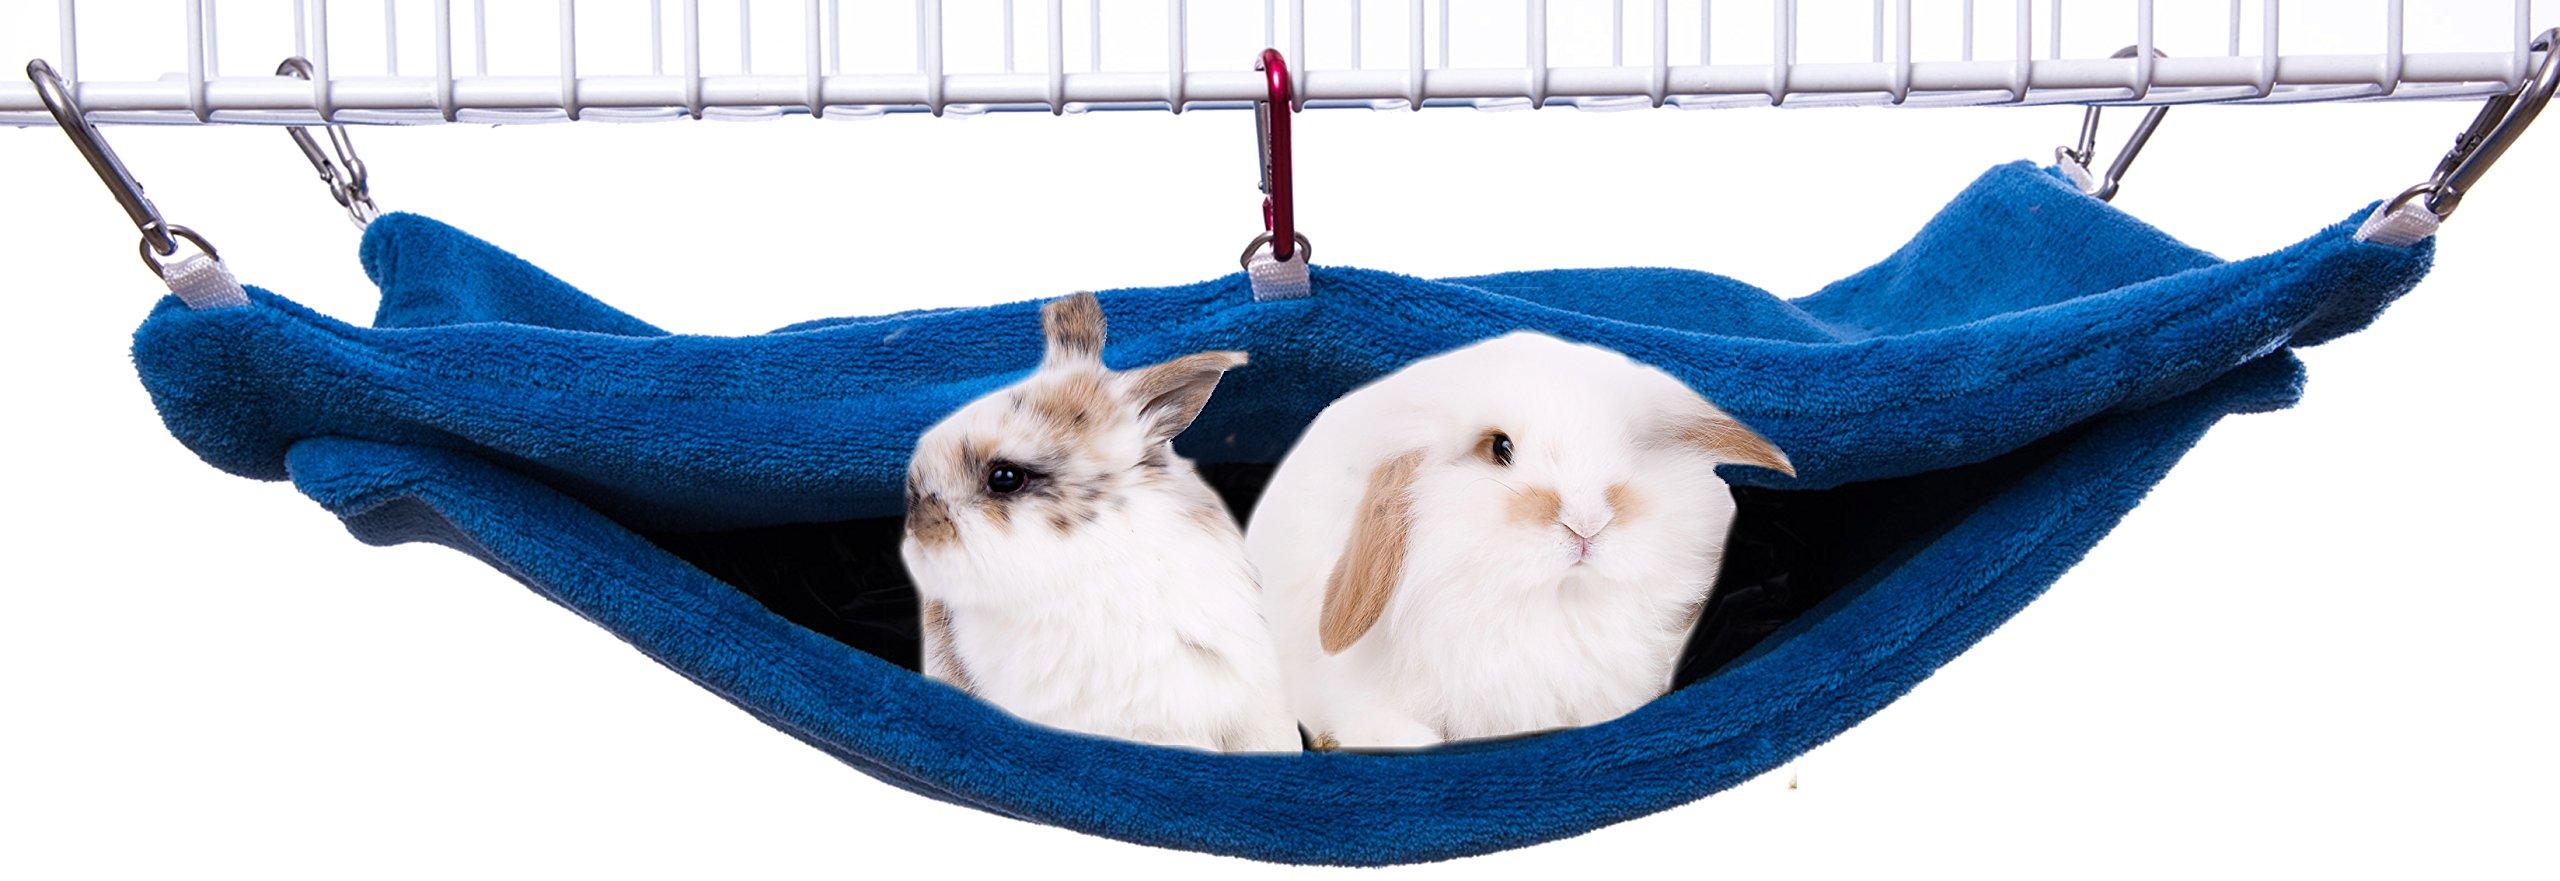 Avianweb Ferret or Bunny Pocket Hammock - Made in The USA (Powder Blue)